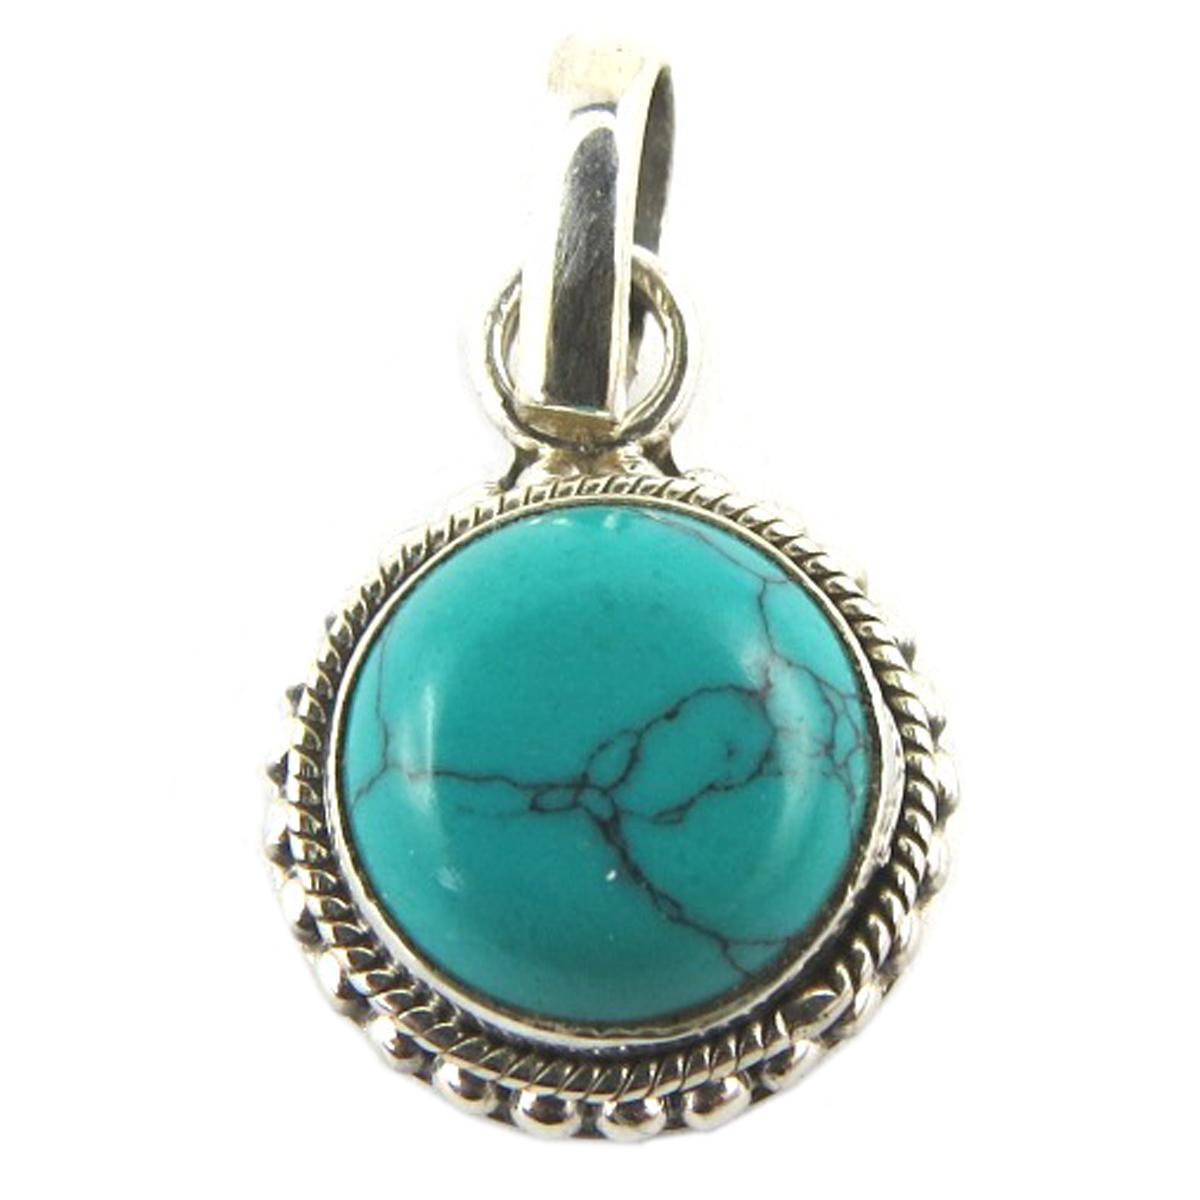 Pendentif Argent artisanal \'Heaven\' turquoise - 13 mm - [Q9866]